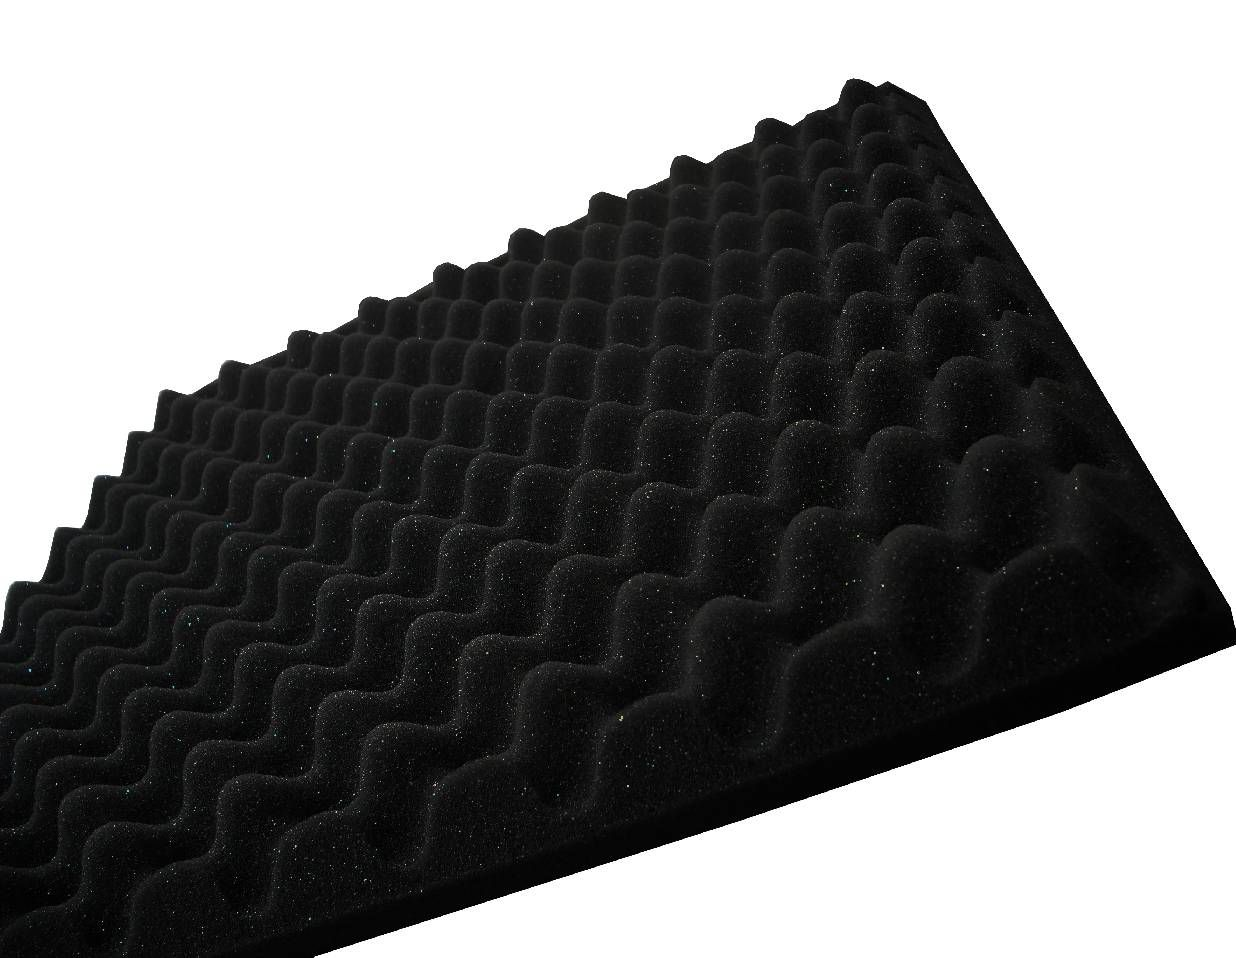 Espuma perfilada - Kit 8 peças - Preto-40mm (2m²)  - Loja SPL Acústica